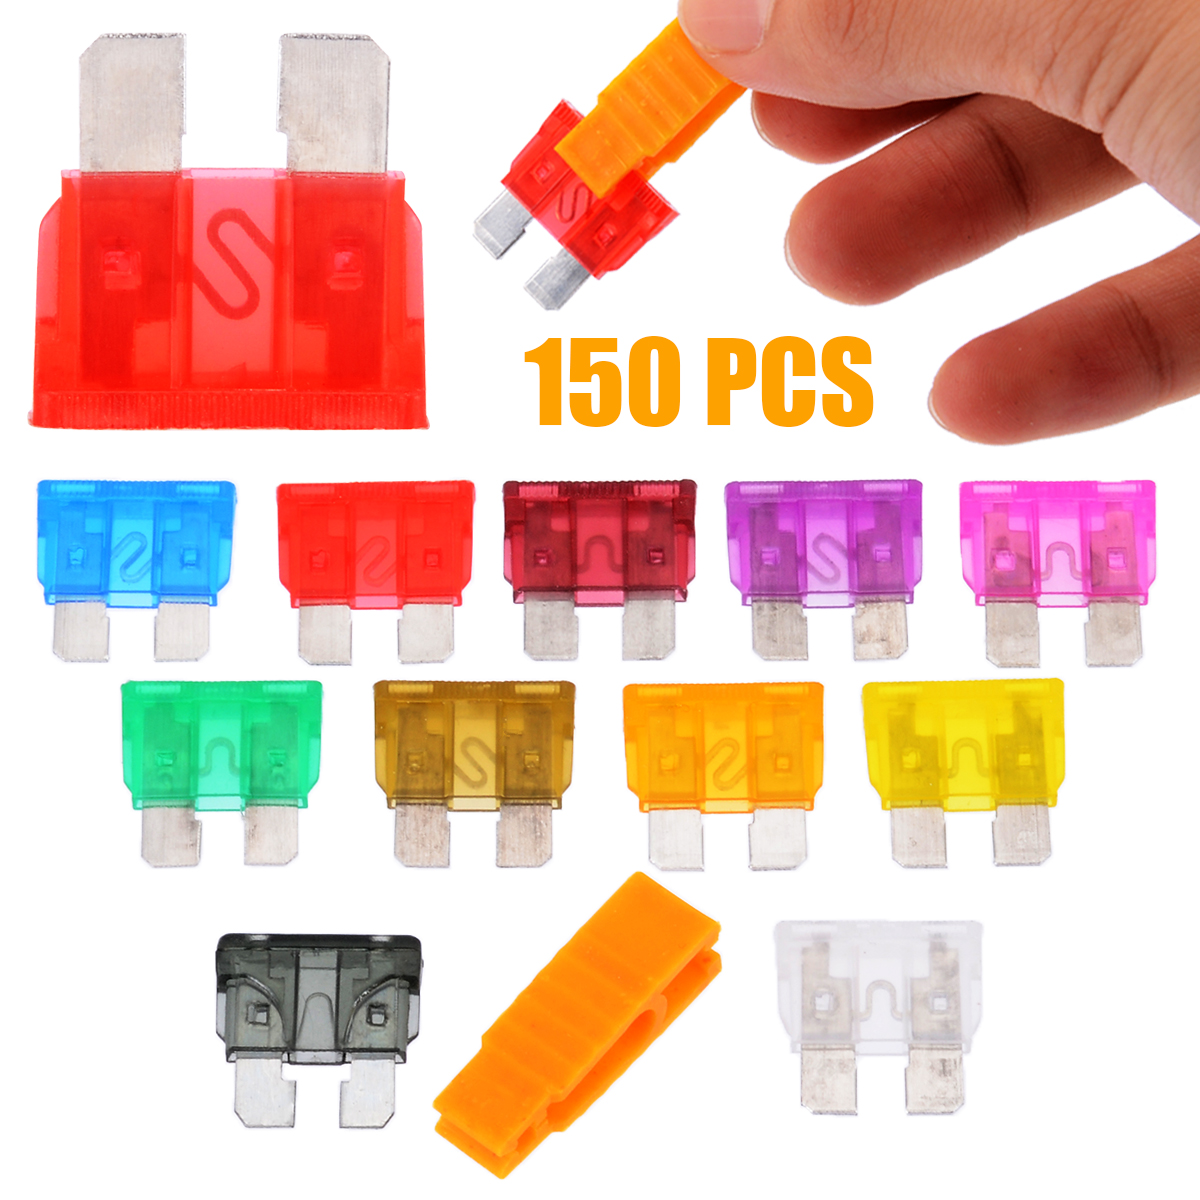 Various Amps)0.2A-20A Choose 10Pcs  5x20mm Car Fast Quick Blow Glass Fuse Clear